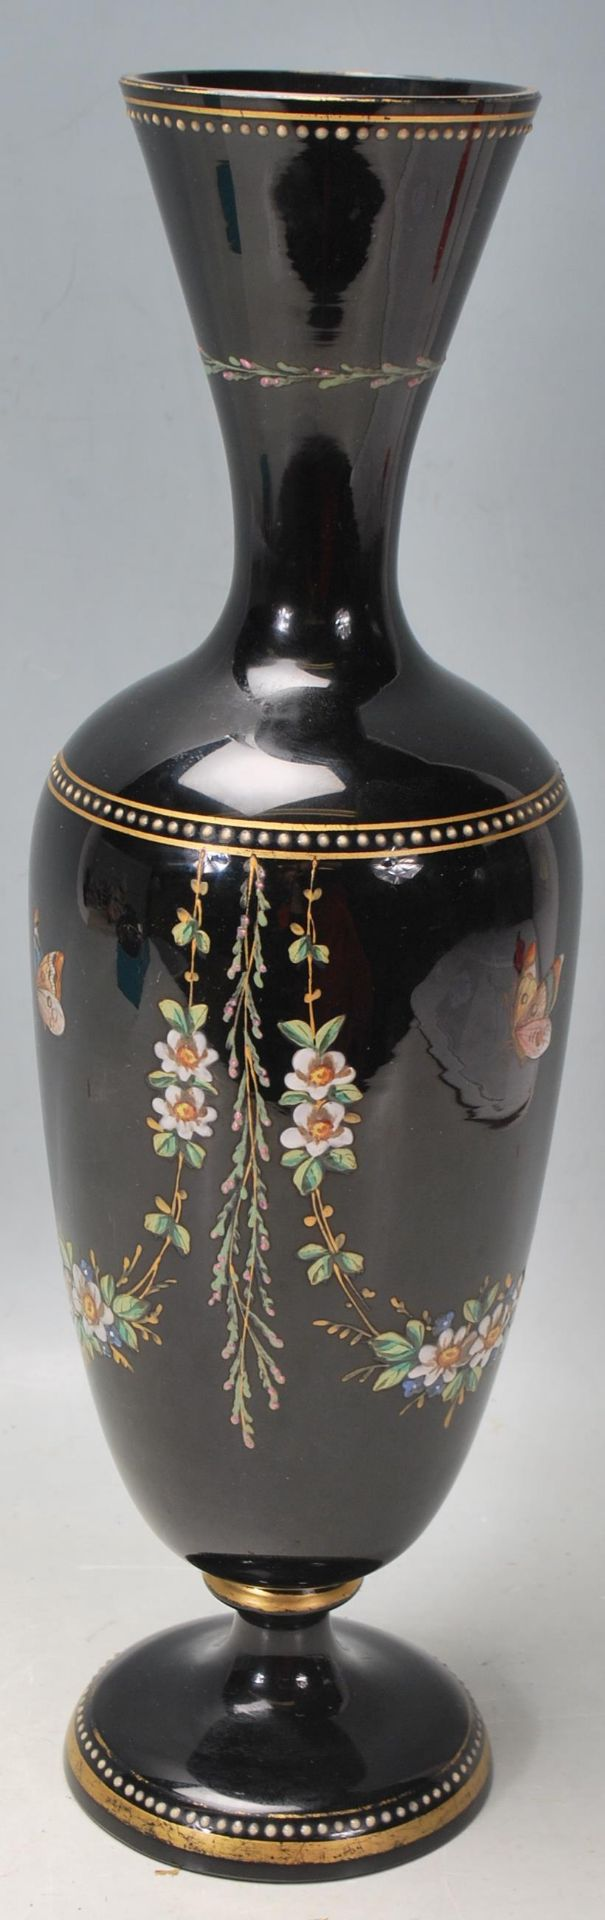 ANTIQUE BLACK AMETHYST BOHEMIAN GLASS VASE - Image 5 of 7